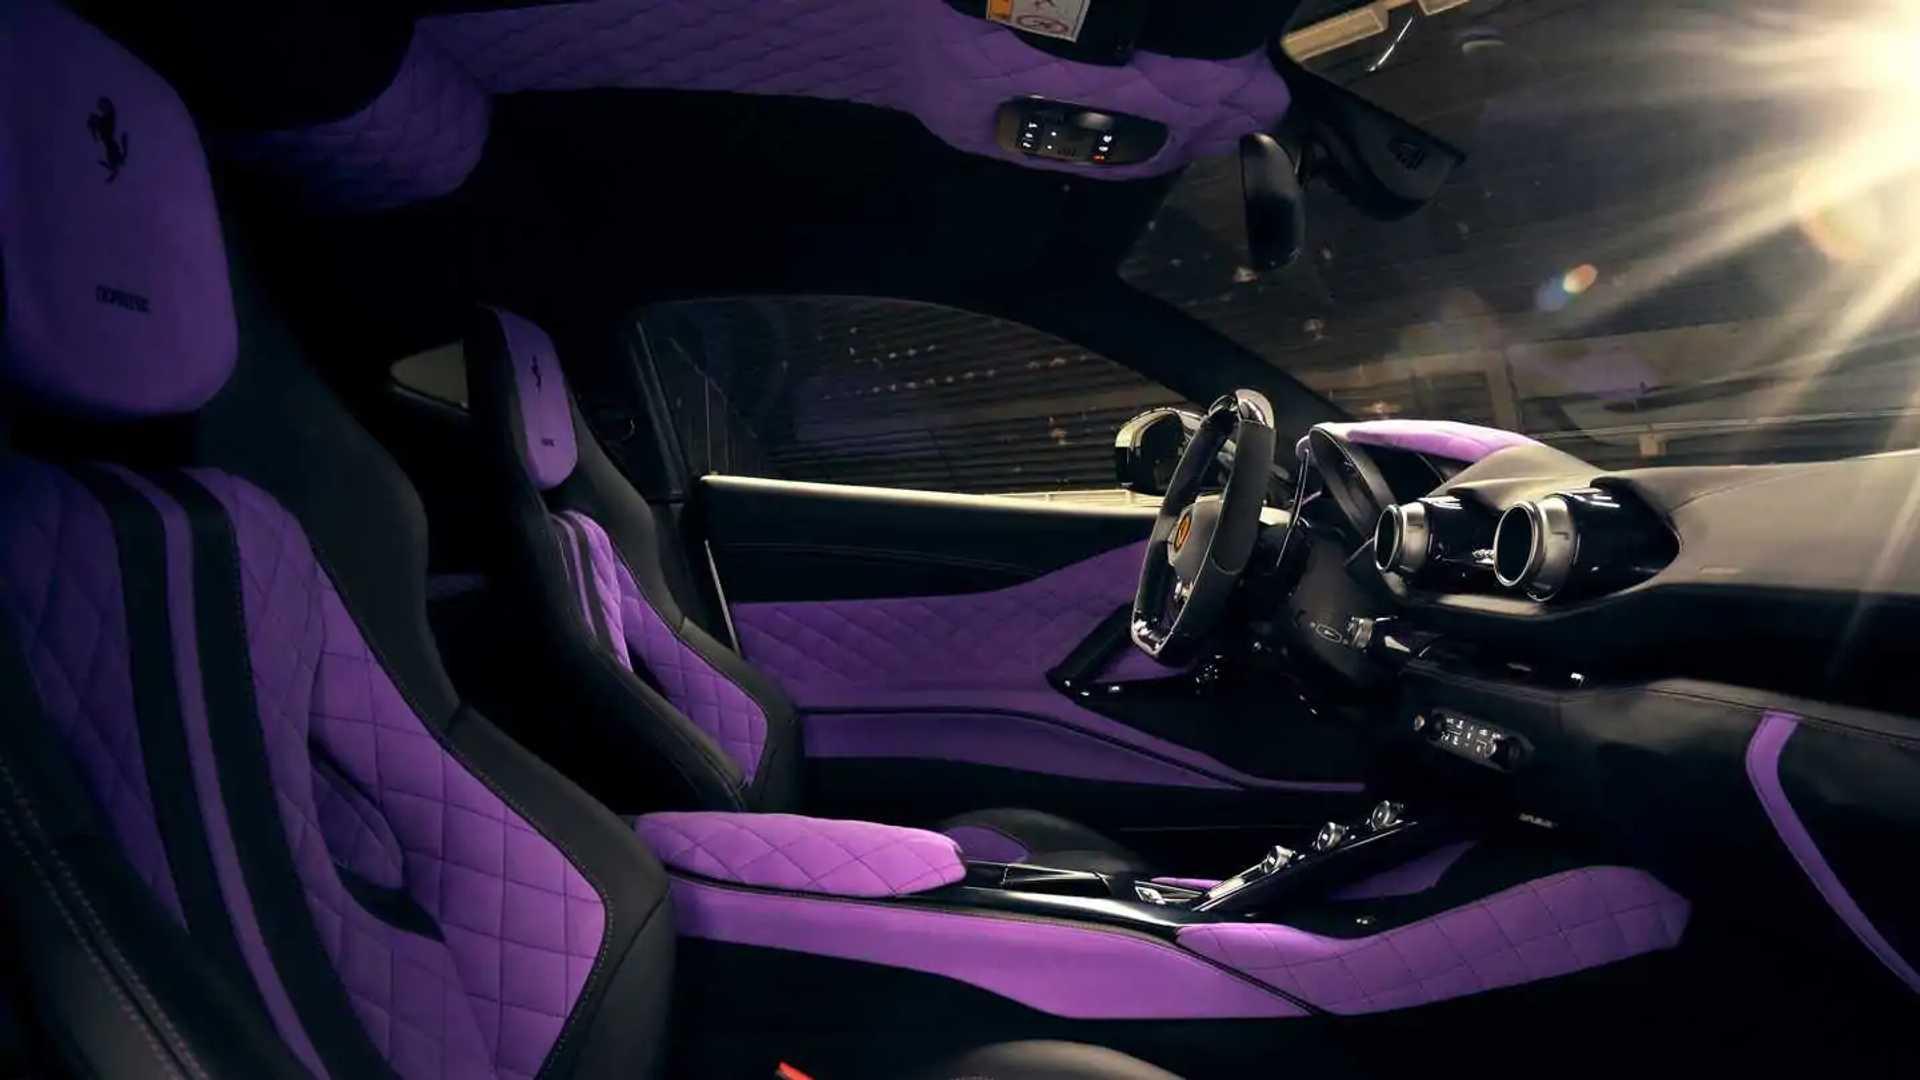 Ferrari 812 Widebody By Novitec Has Wild Purple Interior